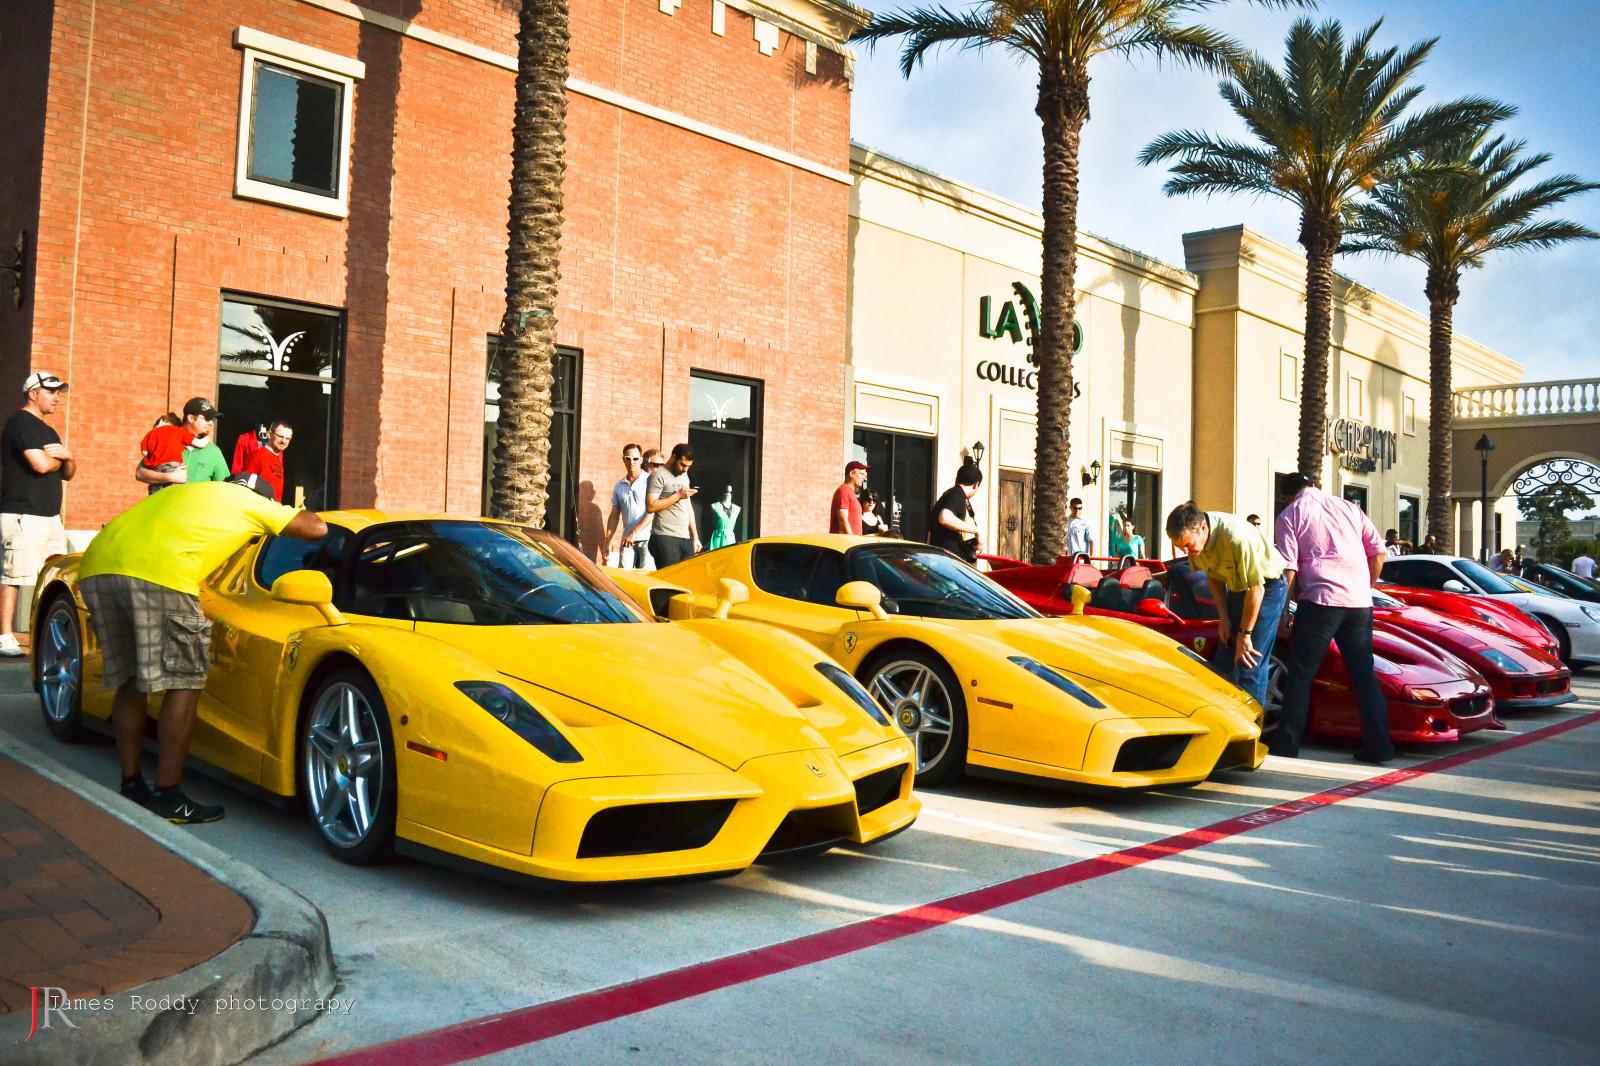 Papel De Parede Amarelo Nikon Texas Houston Ferrari Enzo Gto F40 F50 599 Lightroom3 D3100 4503x3002 1026151 Papel De Parede Para Pc Wallhere